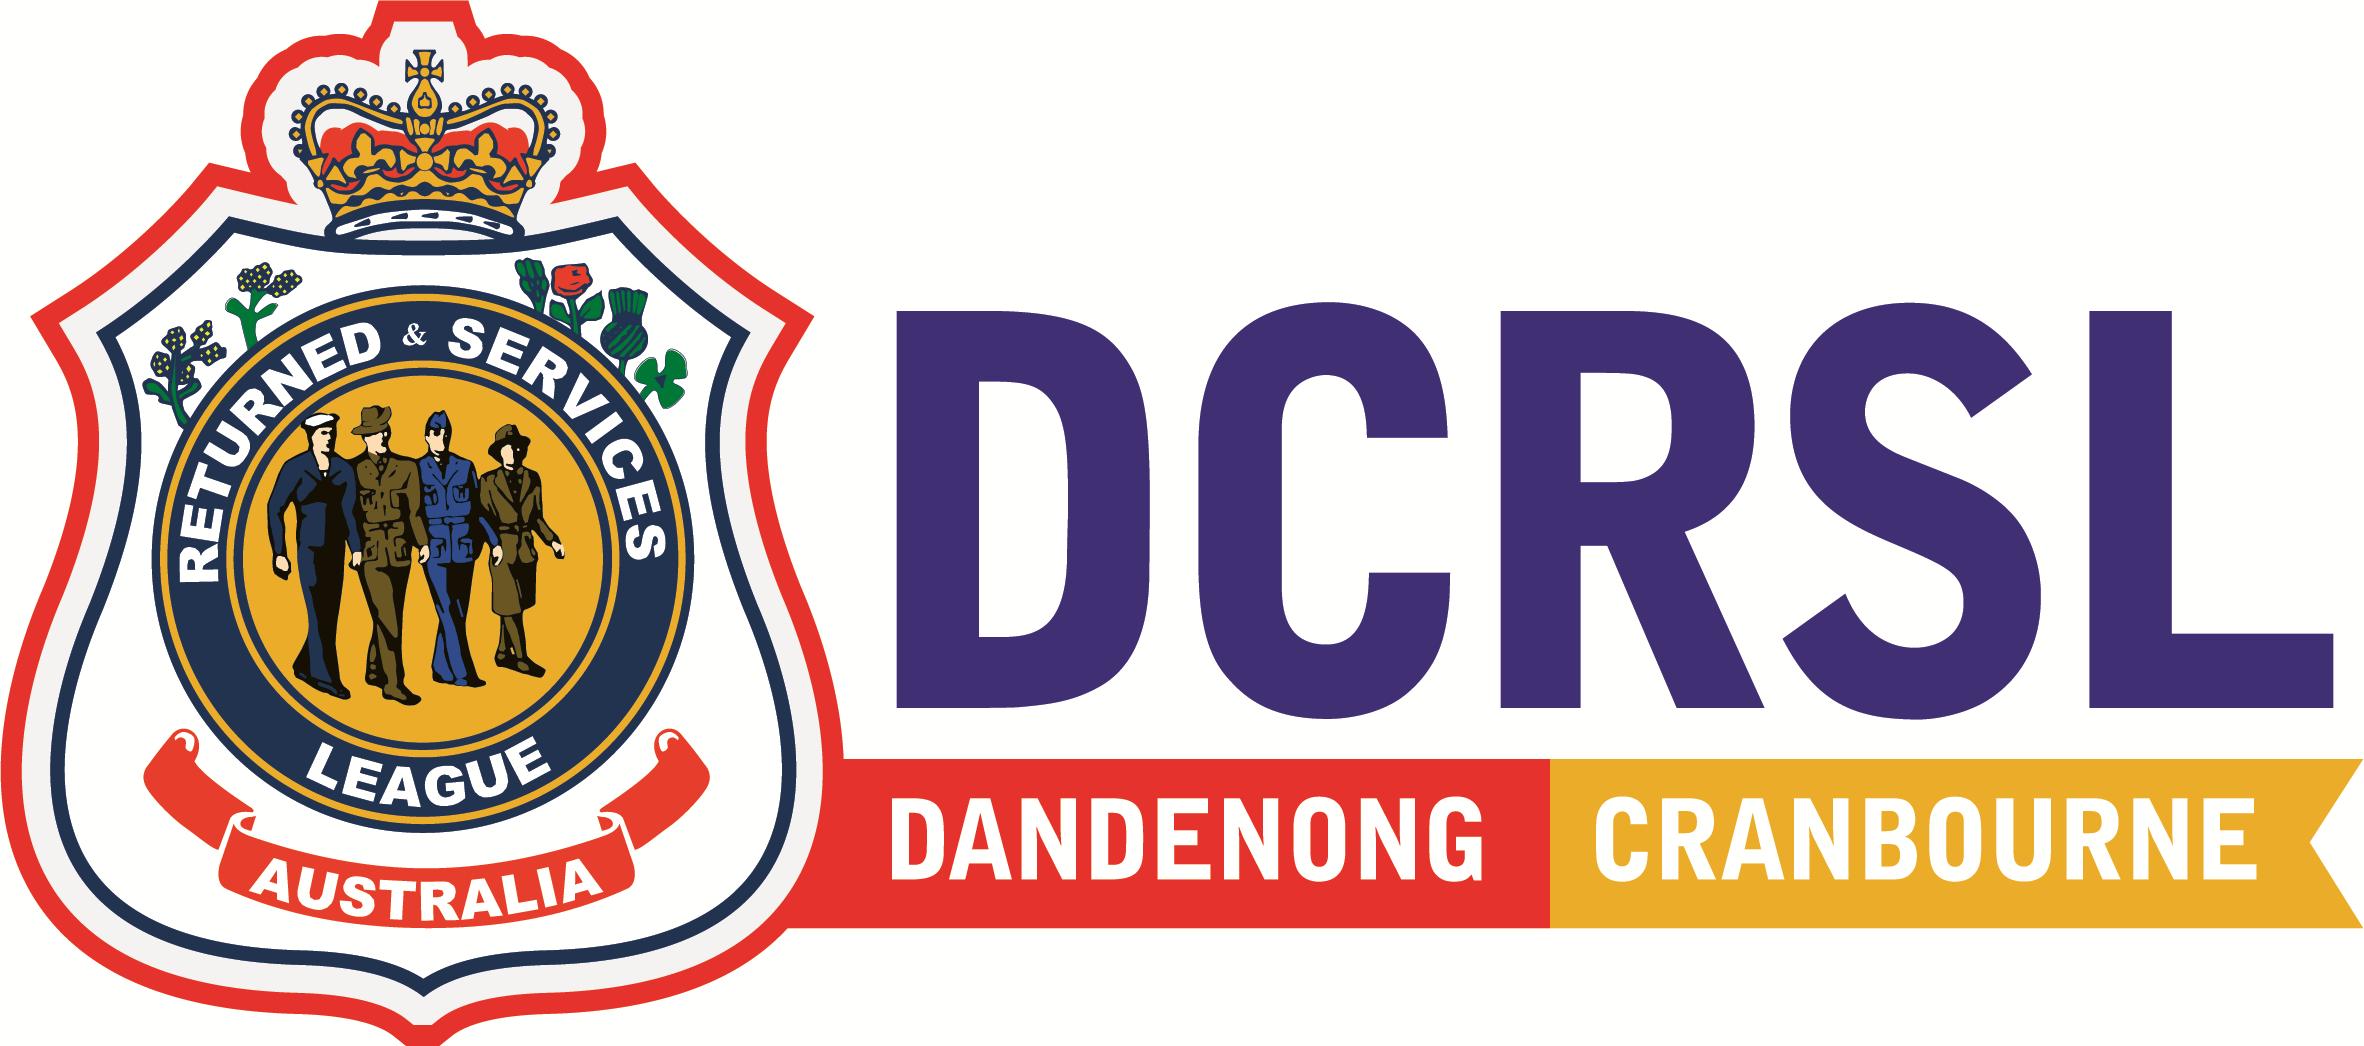 Dandenong Cranbourne RSL